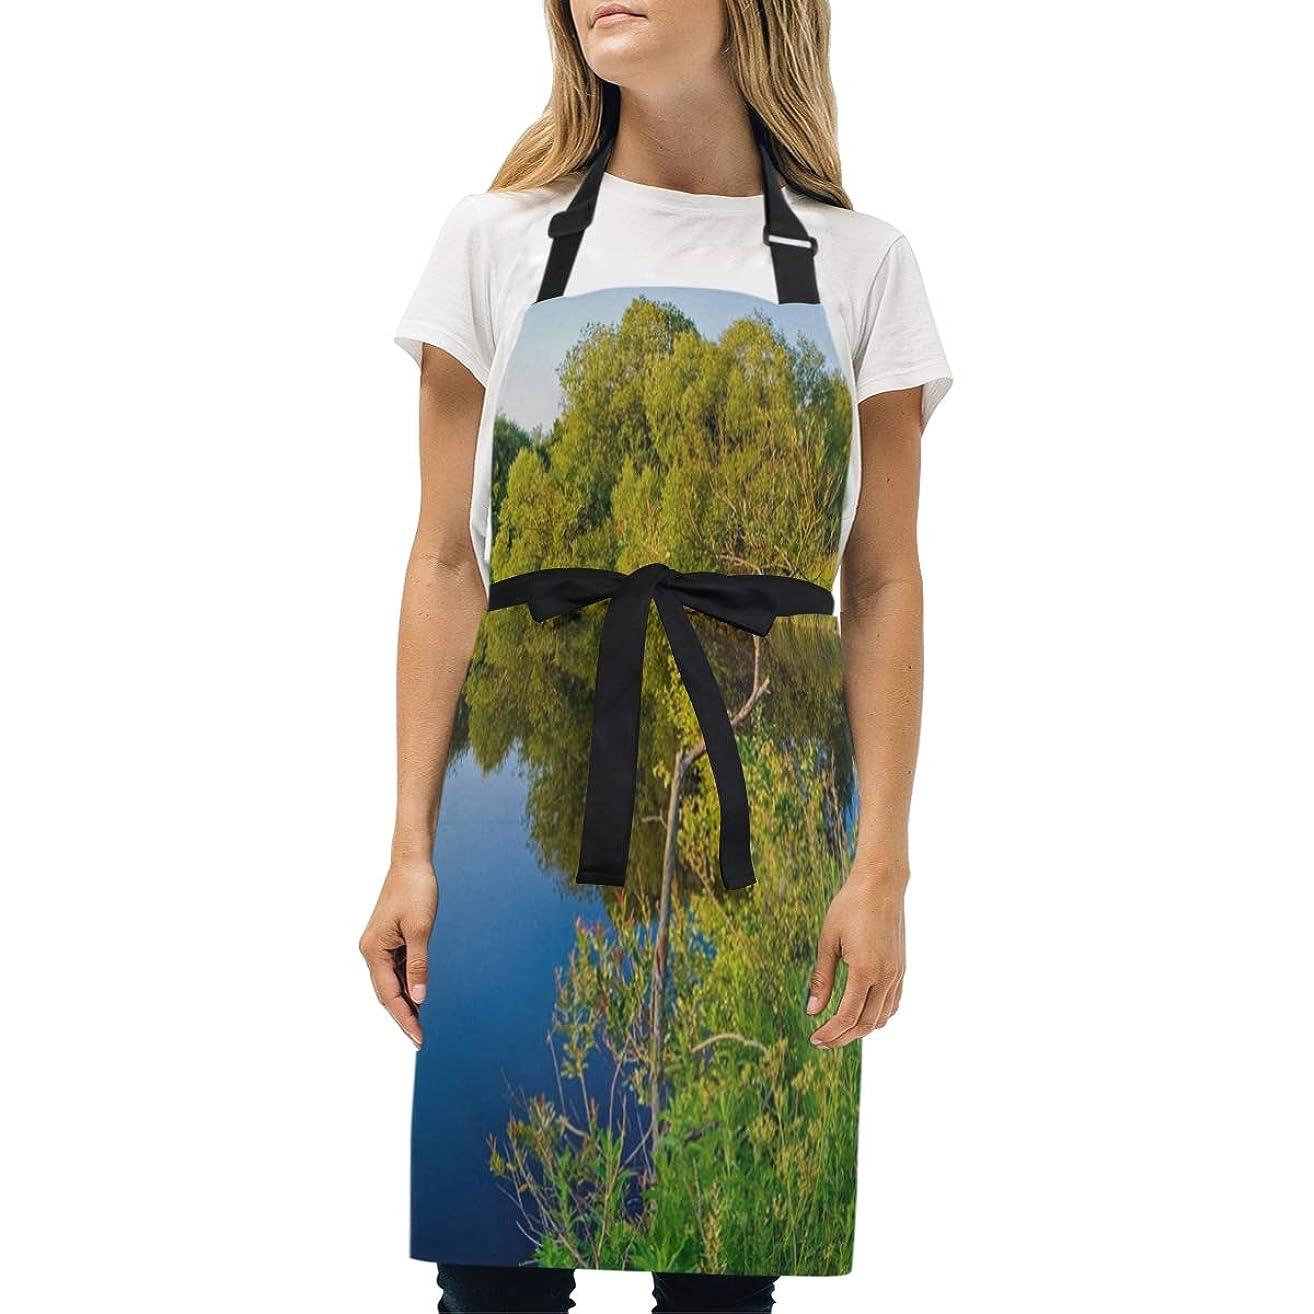 HJudge Womens Aprons Swan Reflection Ramya Kitchen Bib Aprons with Pockets Adjustable Buckle on Neck